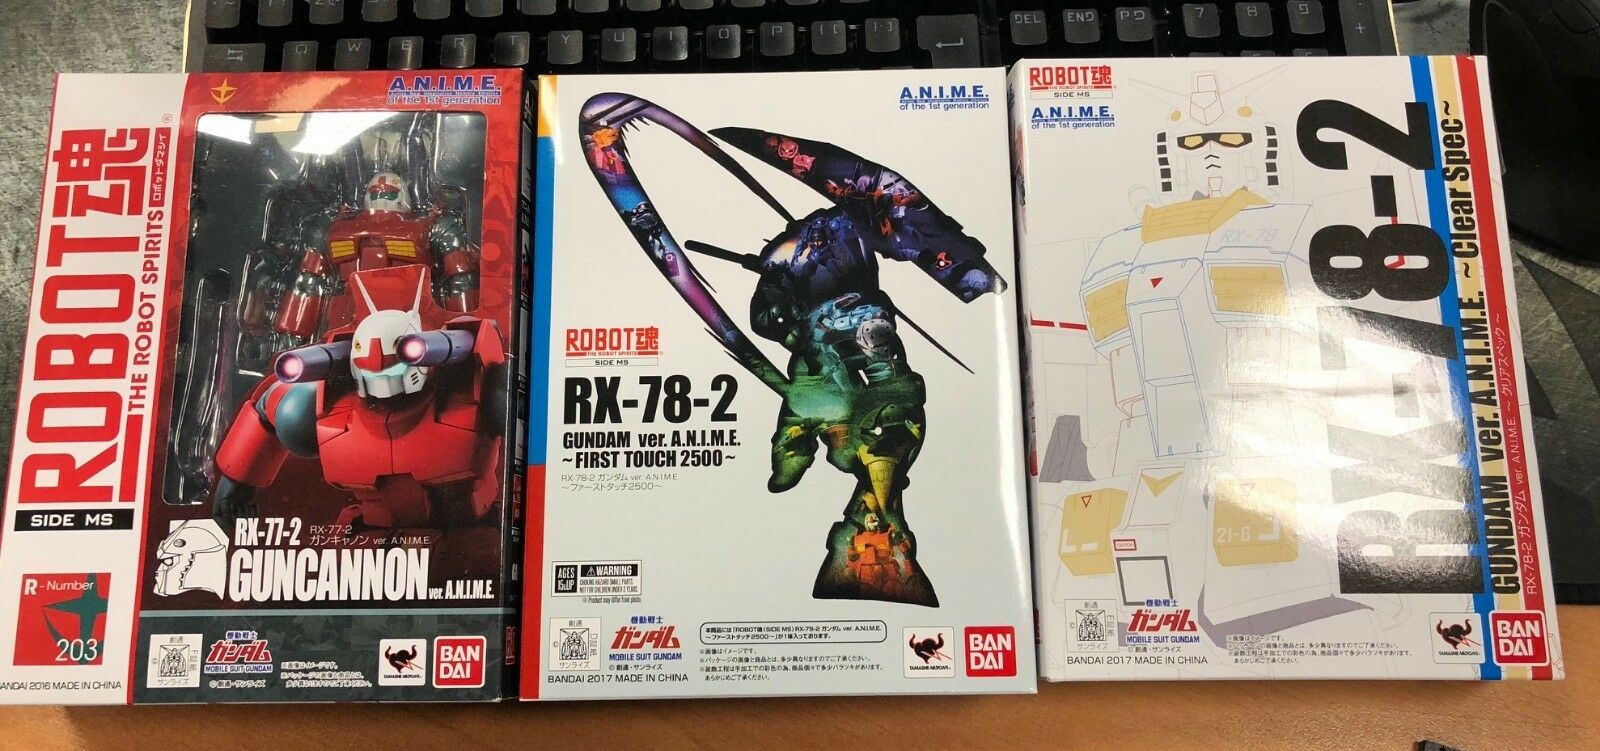 Beai Robot Spirits Anime version lotto Gundam limited version